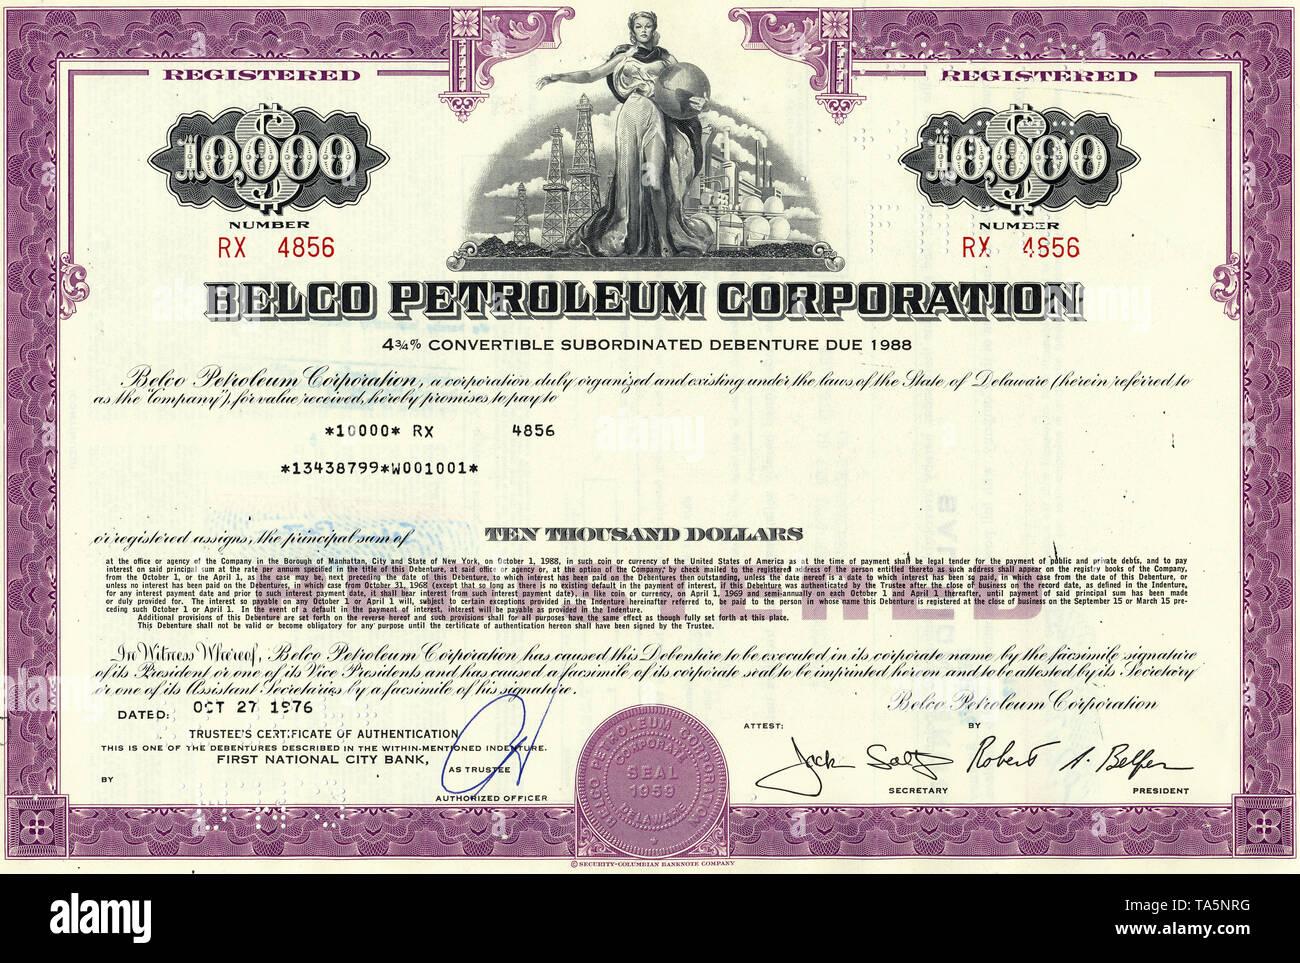 Historical stock certificate of an oil and gas company, a man opening a valve of a pipeline in front of oil derricks, oil tanks and a city, Atlantic Richfield Company, now part of BP, ARCO Pipe Line Company, Delaware, USA, 1977Wertpapier, historische Aktie, Mineralöl- und Erdgasunternehmen,  Motiv: Eine junge Frau hält die Weltkugel vor Bohrtürmen und einer Erdöl-Raffinerie, Belco Petroleum Corporation,  heute Belco Oil & Gas Corporation, 1976, Delaware, USA - Stock Image